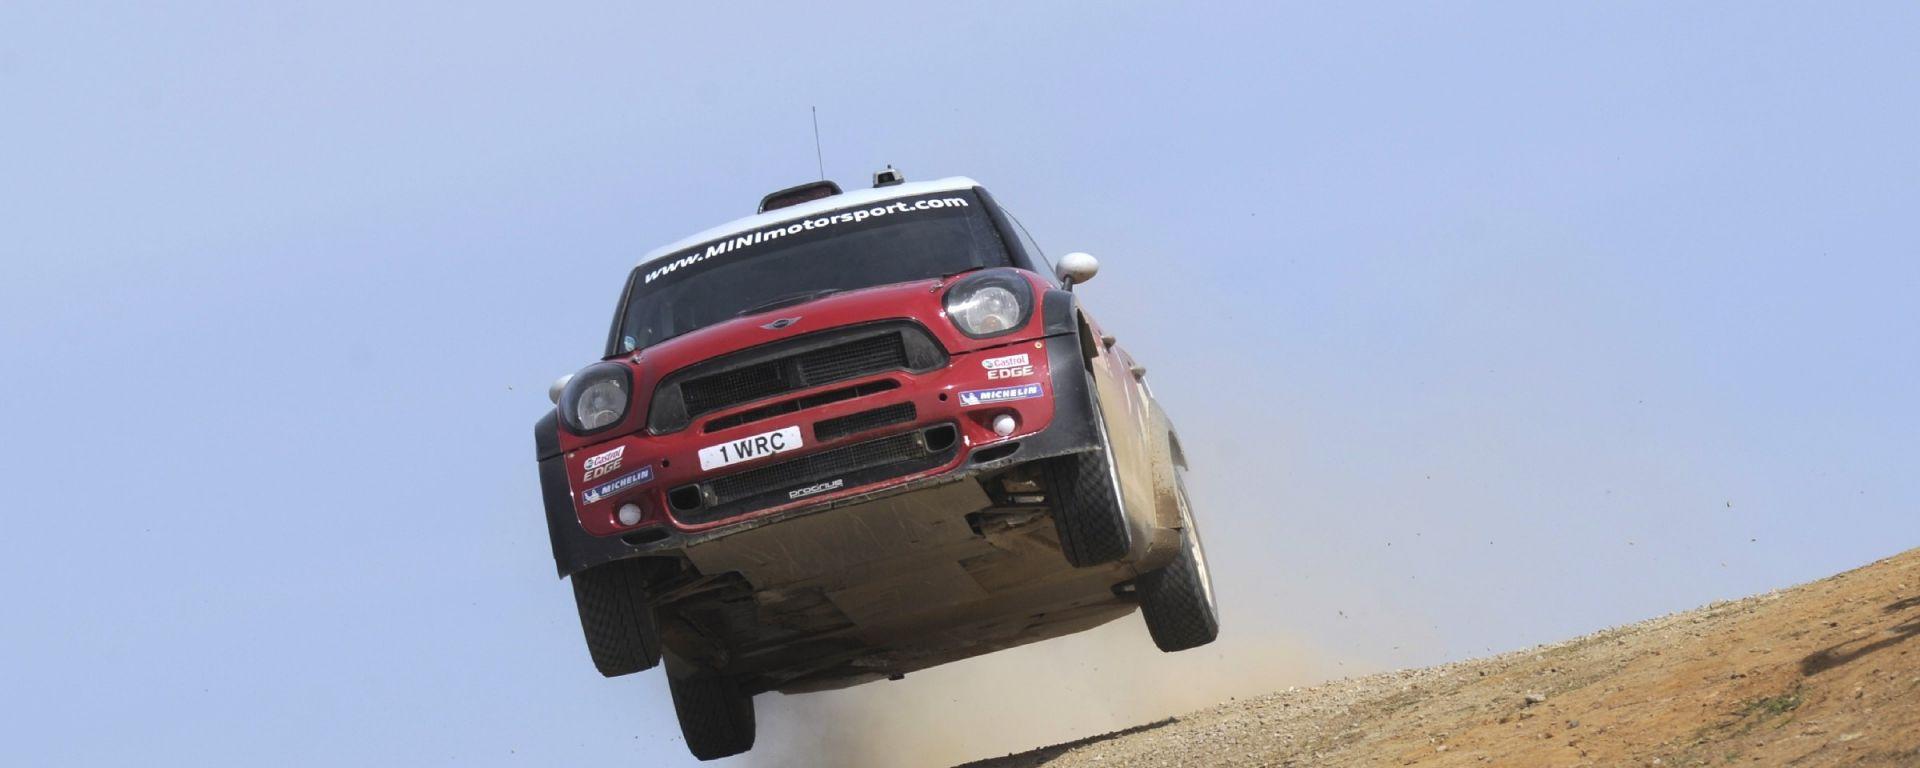 Rally d'Italia Sardegna 2011